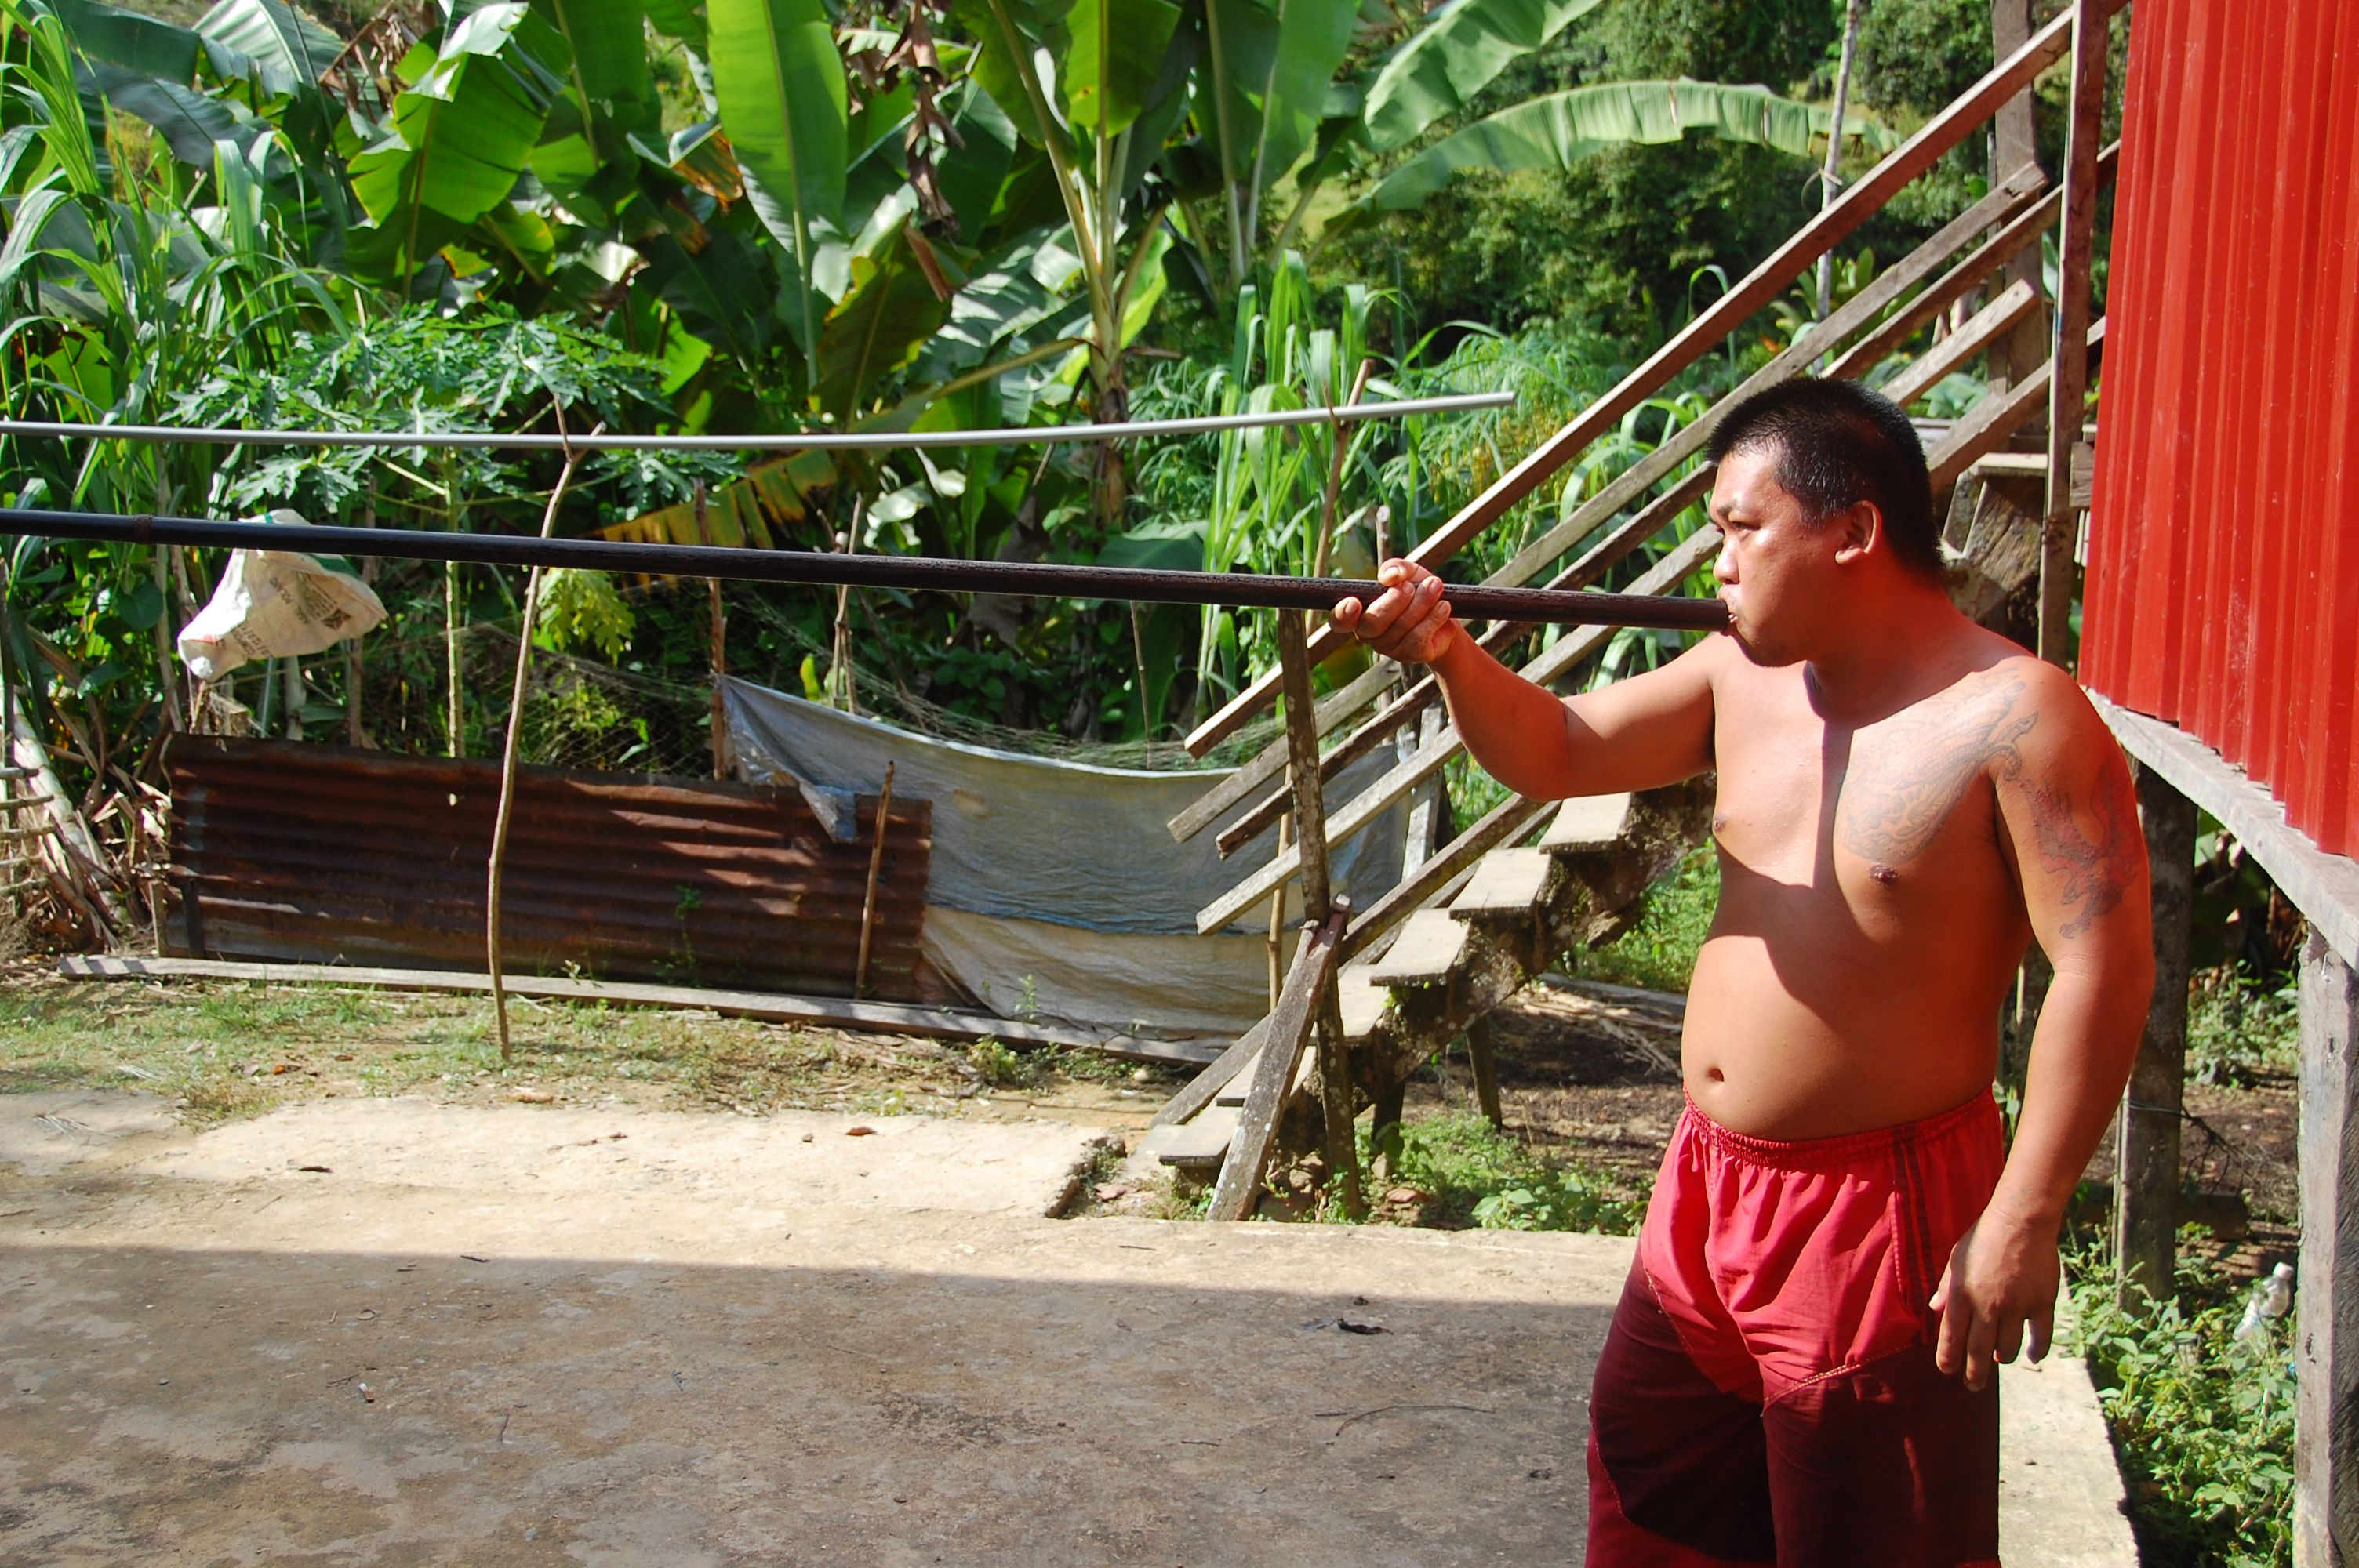 Dayak man in Sarawak Borneo with Blowgun